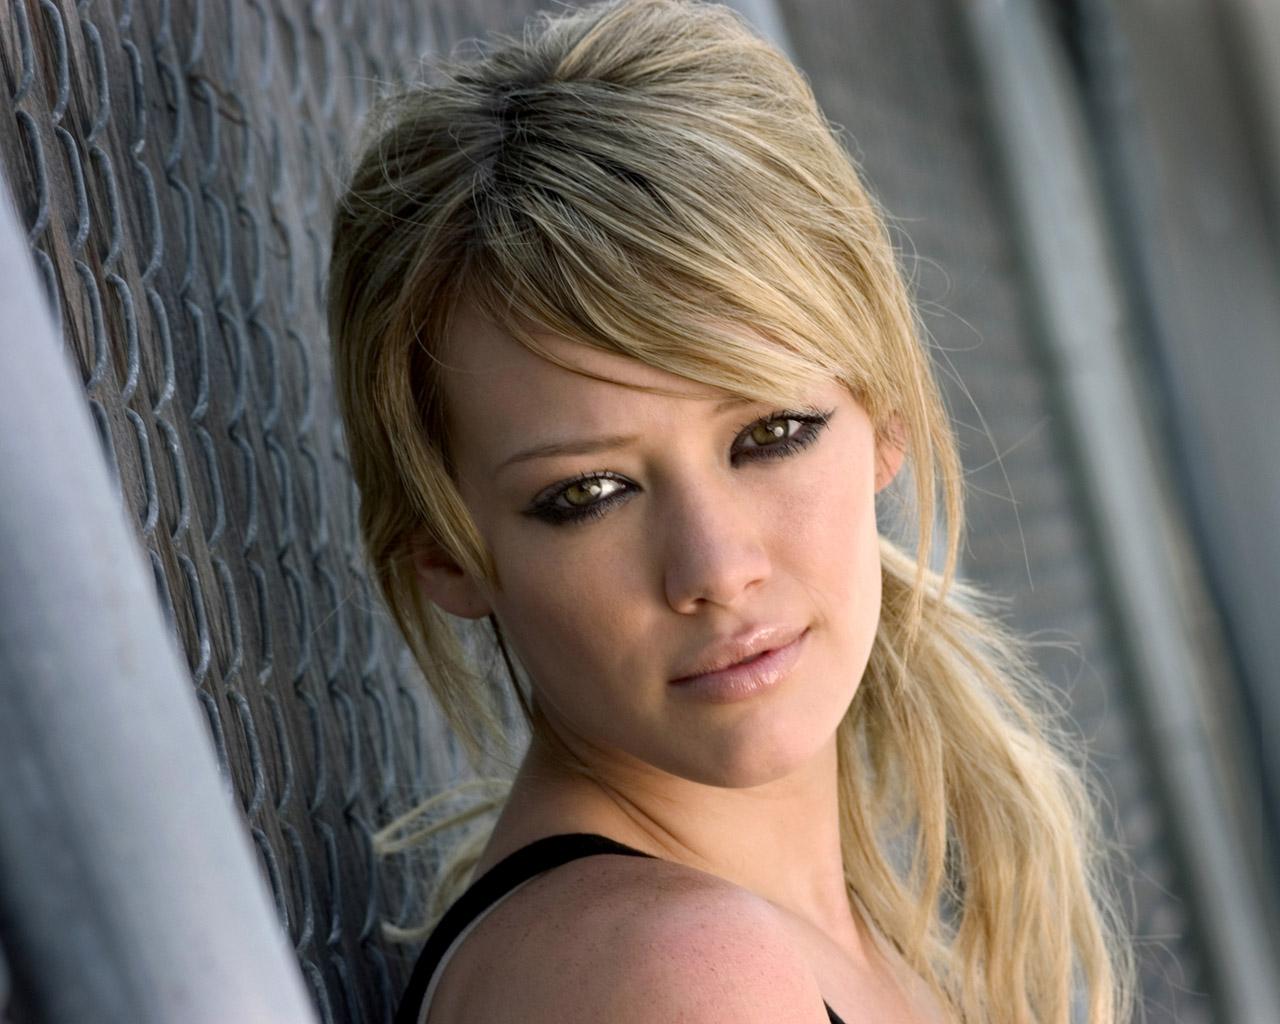 http://4.bp.blogspot.com/-VNxsoOWQYrs/T3xk2pmtkII/AAAAAAAAF3I/ZJOnVZ2wqg8/s1600/Hilary-Duff.jpg